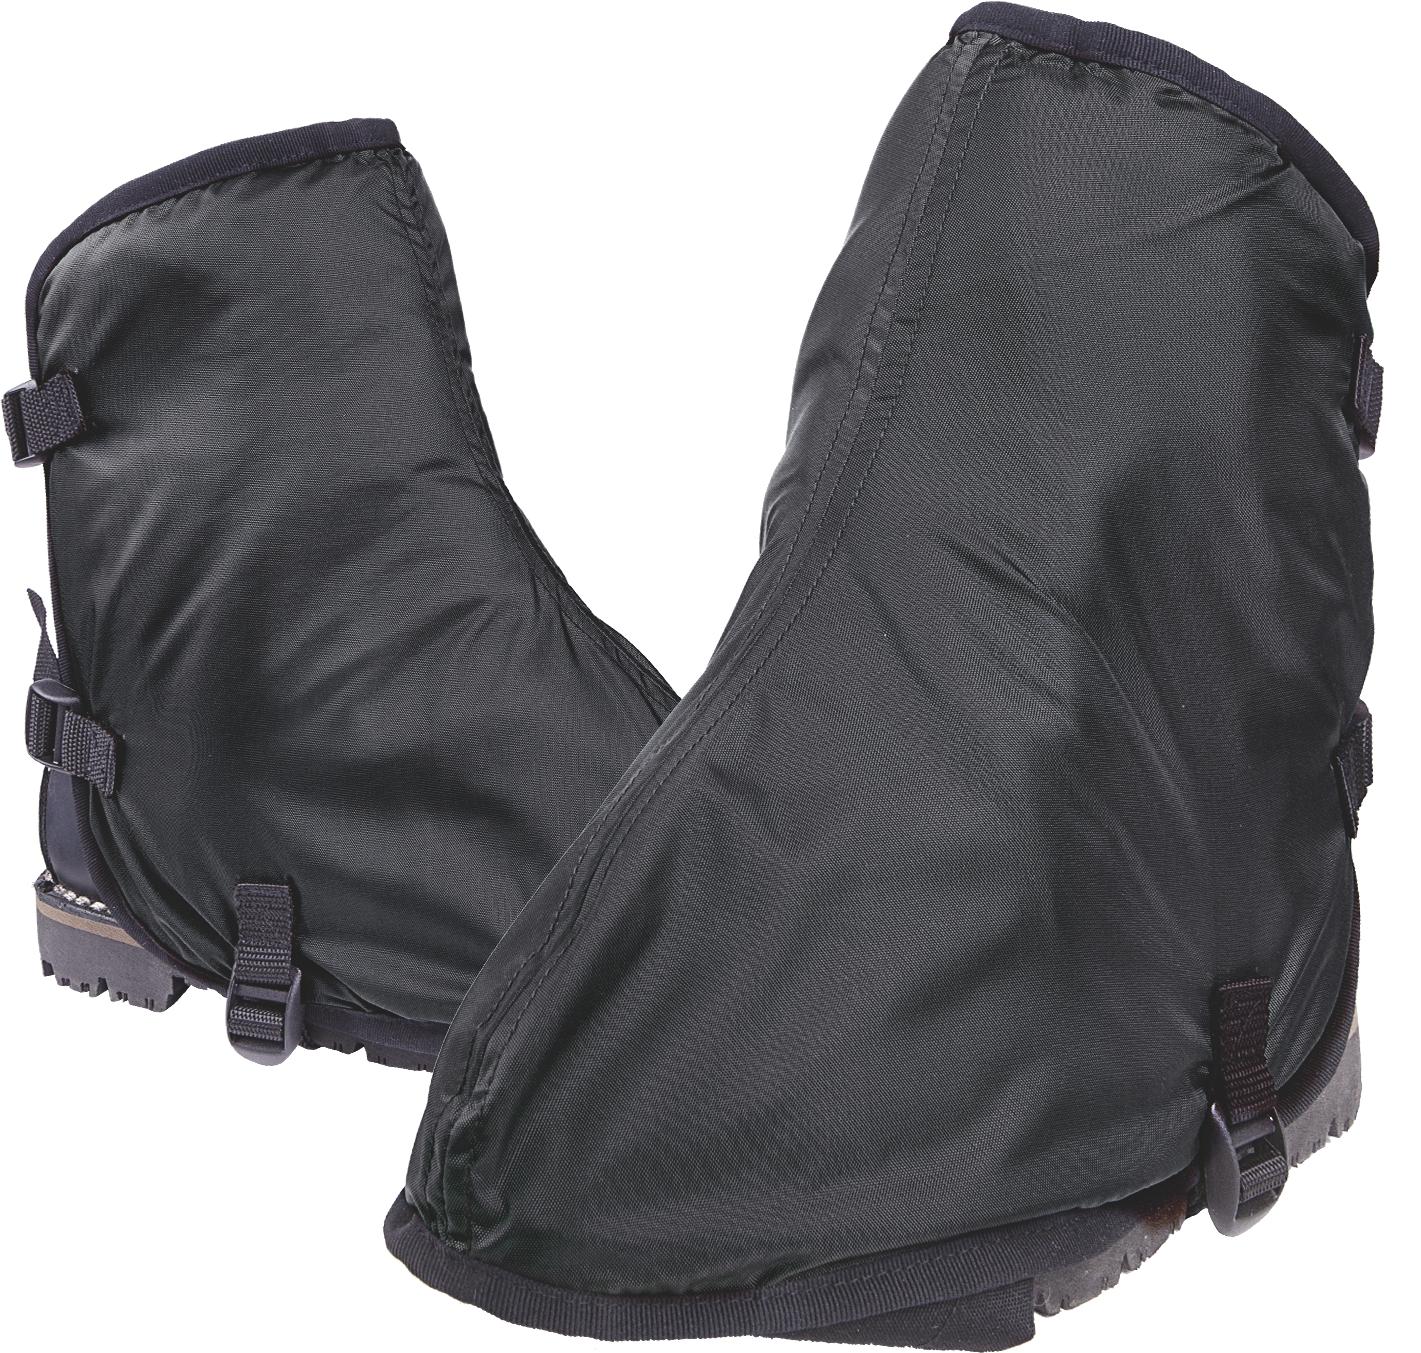 Guêtres noir 1SXG - Noir SIP Protection